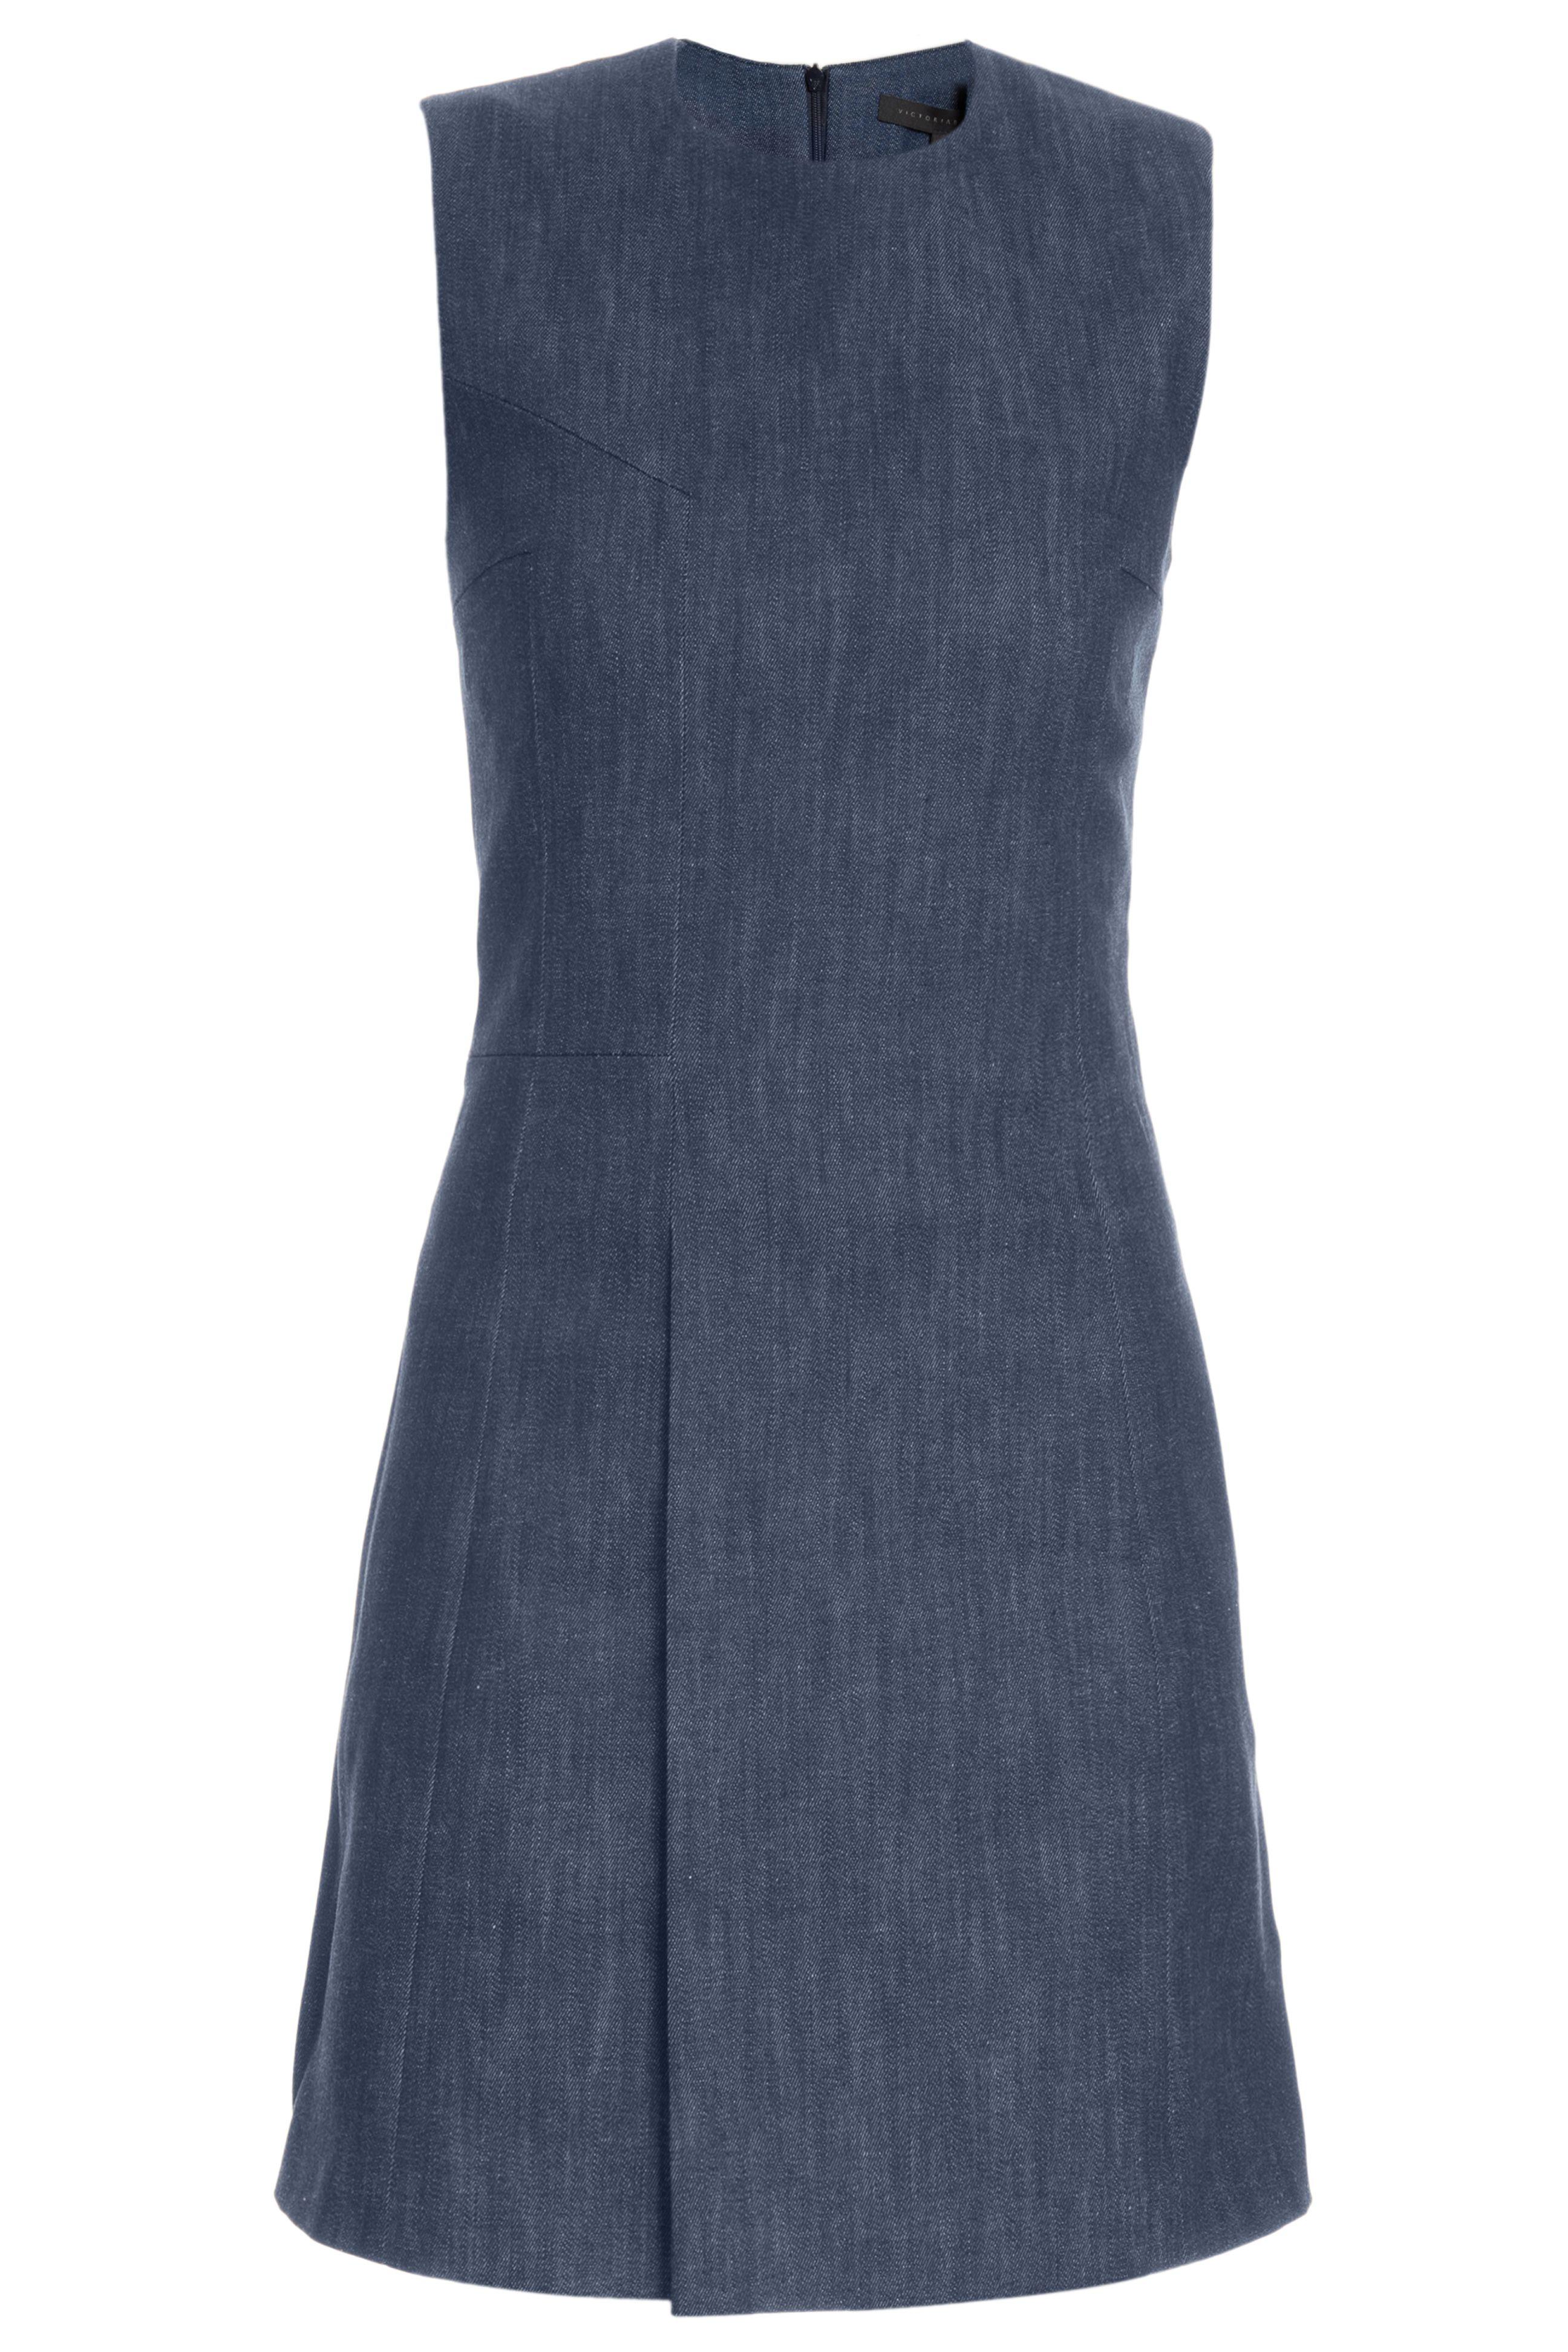 Victoria Beckham Blue Front Fold Shift Dress Dresses Shift Dress Clothes Design [ 3888 x 2592 Pixel ]